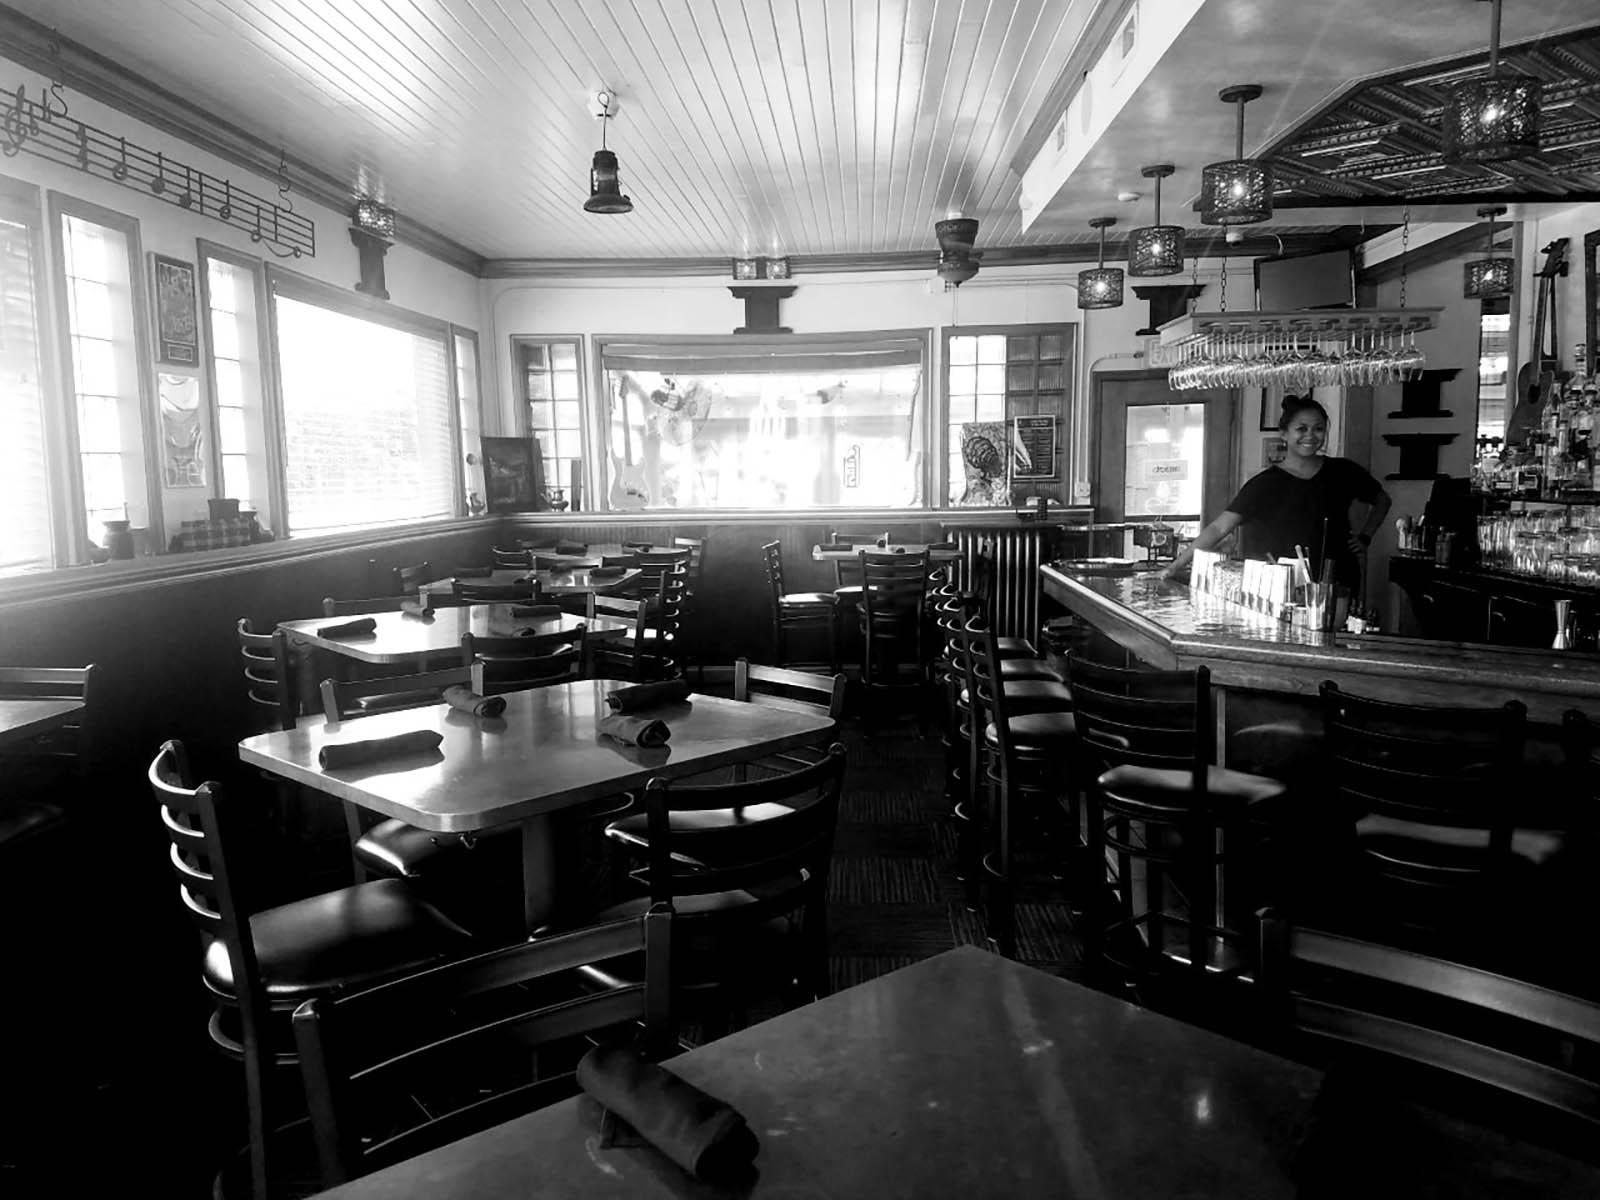 The Cheel bar